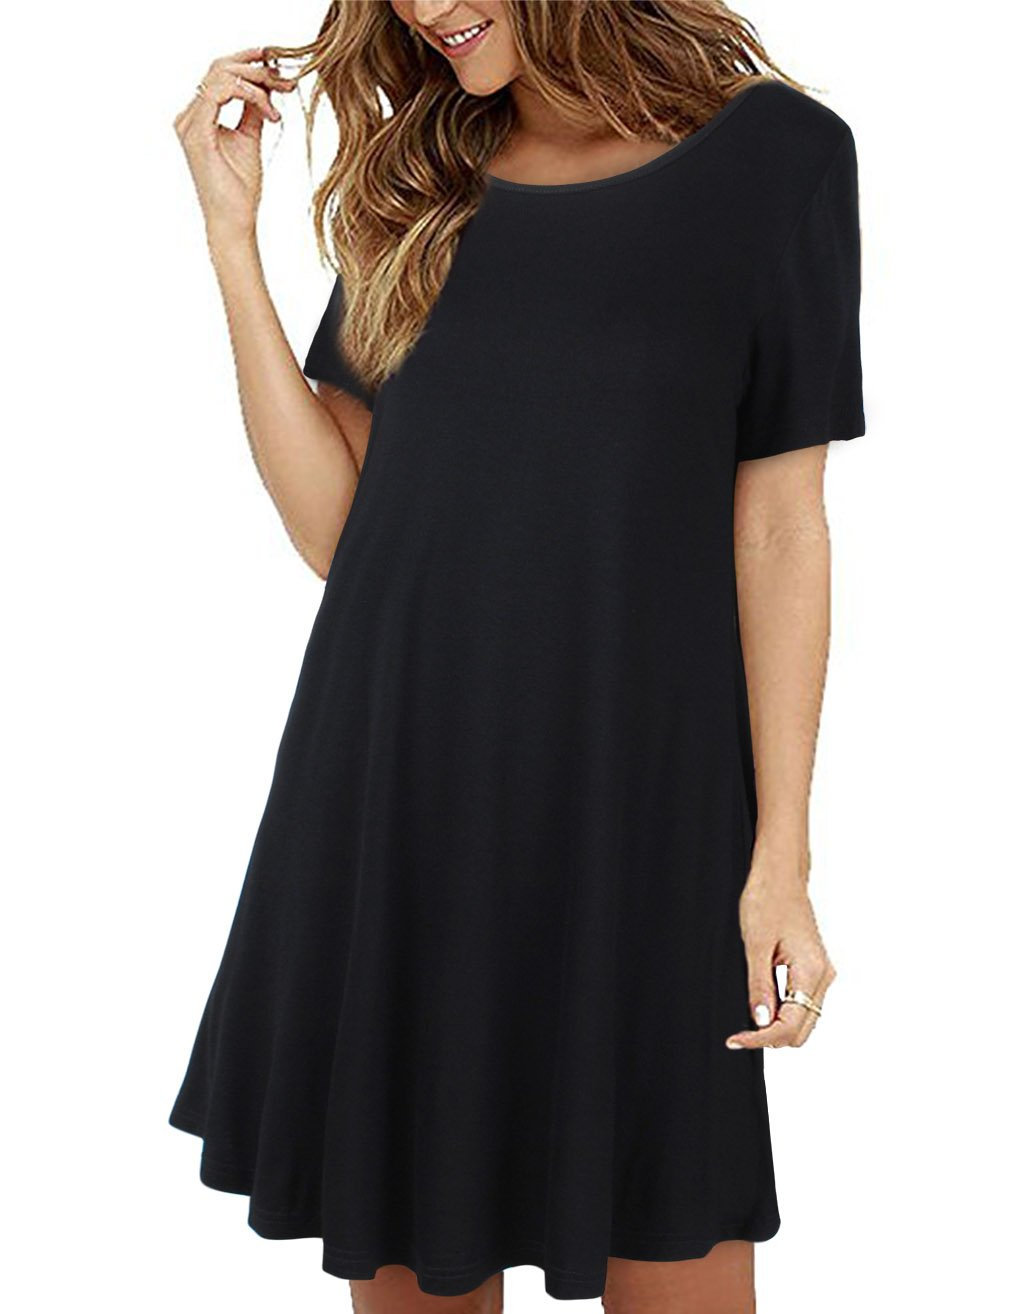 Faddare Womens Shirt Dress Short Sleeve, Teens Scoop Neck Basic Simple A-Line Tunic Dress, Black M